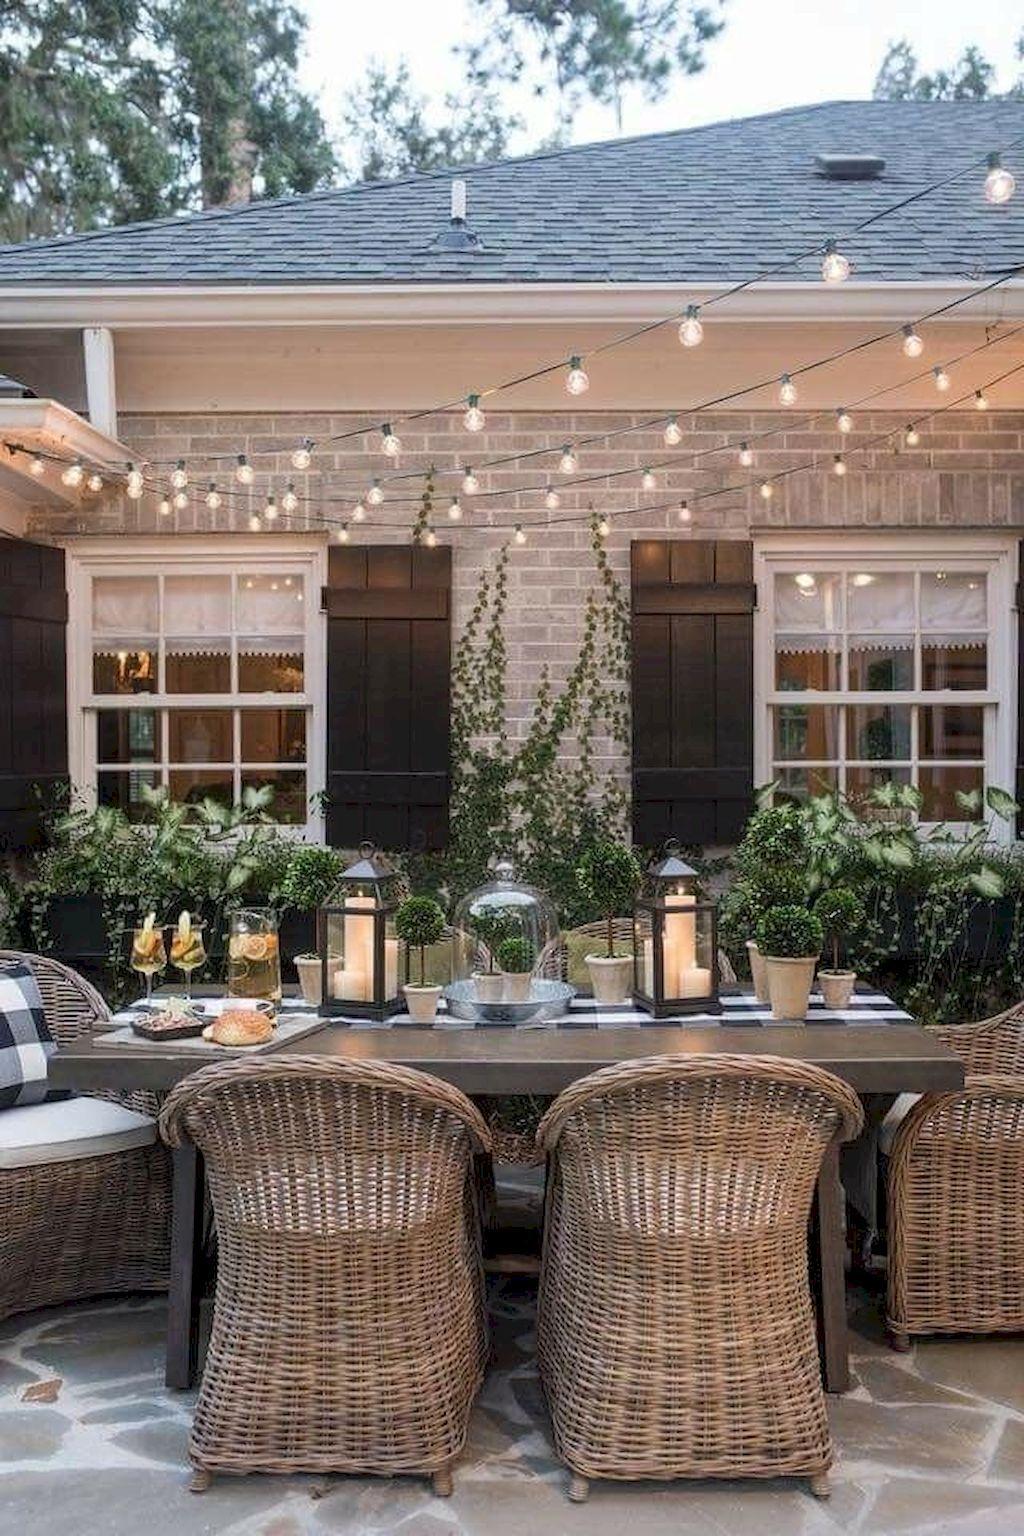 Adorable 65 Inspiring Outdoor Living Space Design Ideas Https Architeworks Com 65 Inspiring Outdoor Outdoor Living Space Design Patio Design Backyard Design